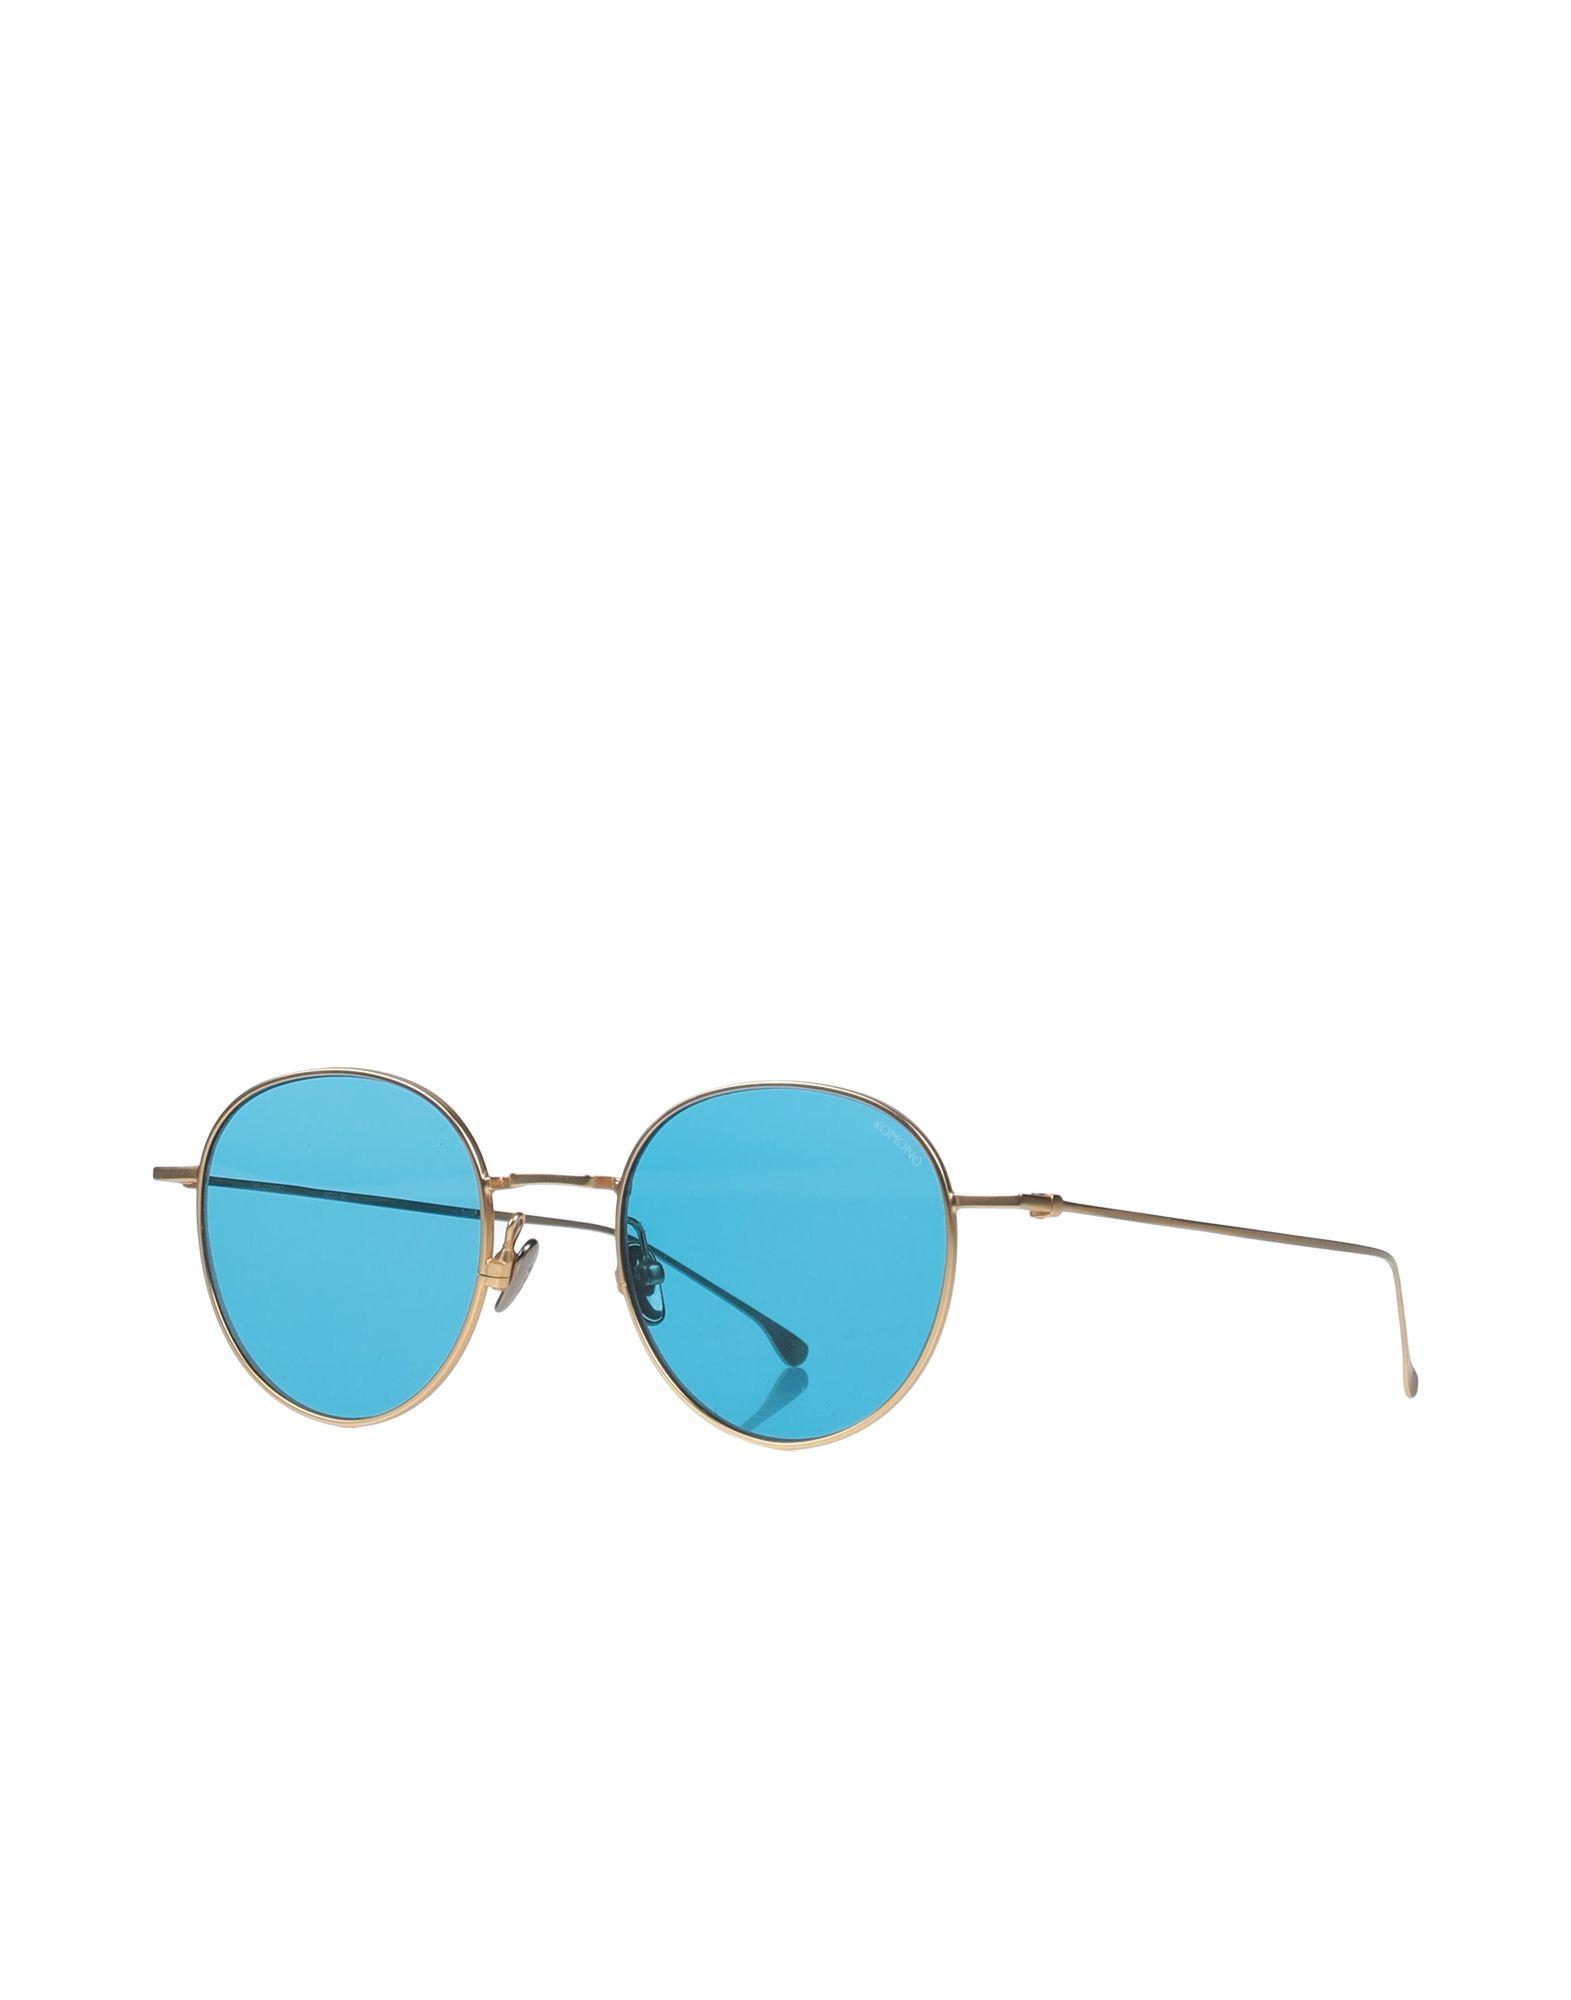 KOMONO Sunglasses - Item 46680850